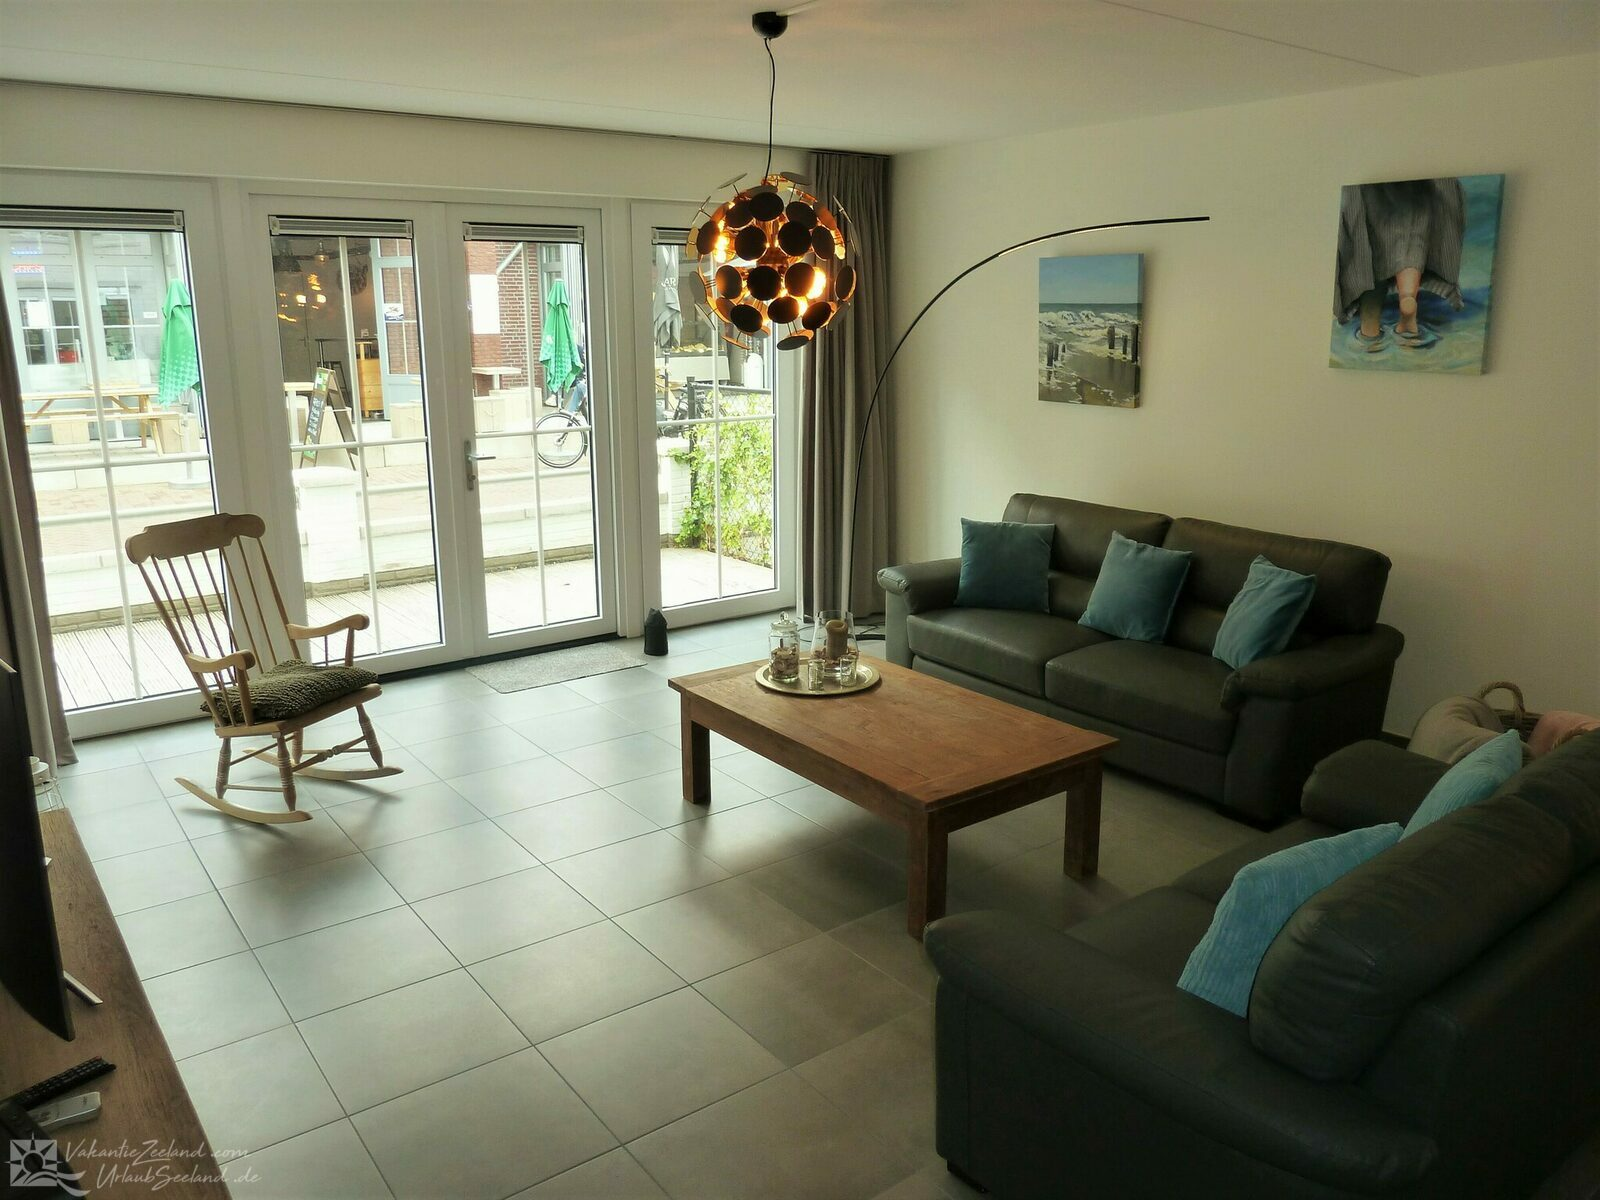 VZ966 Ferienwohnung in Koudekerke Dishoek